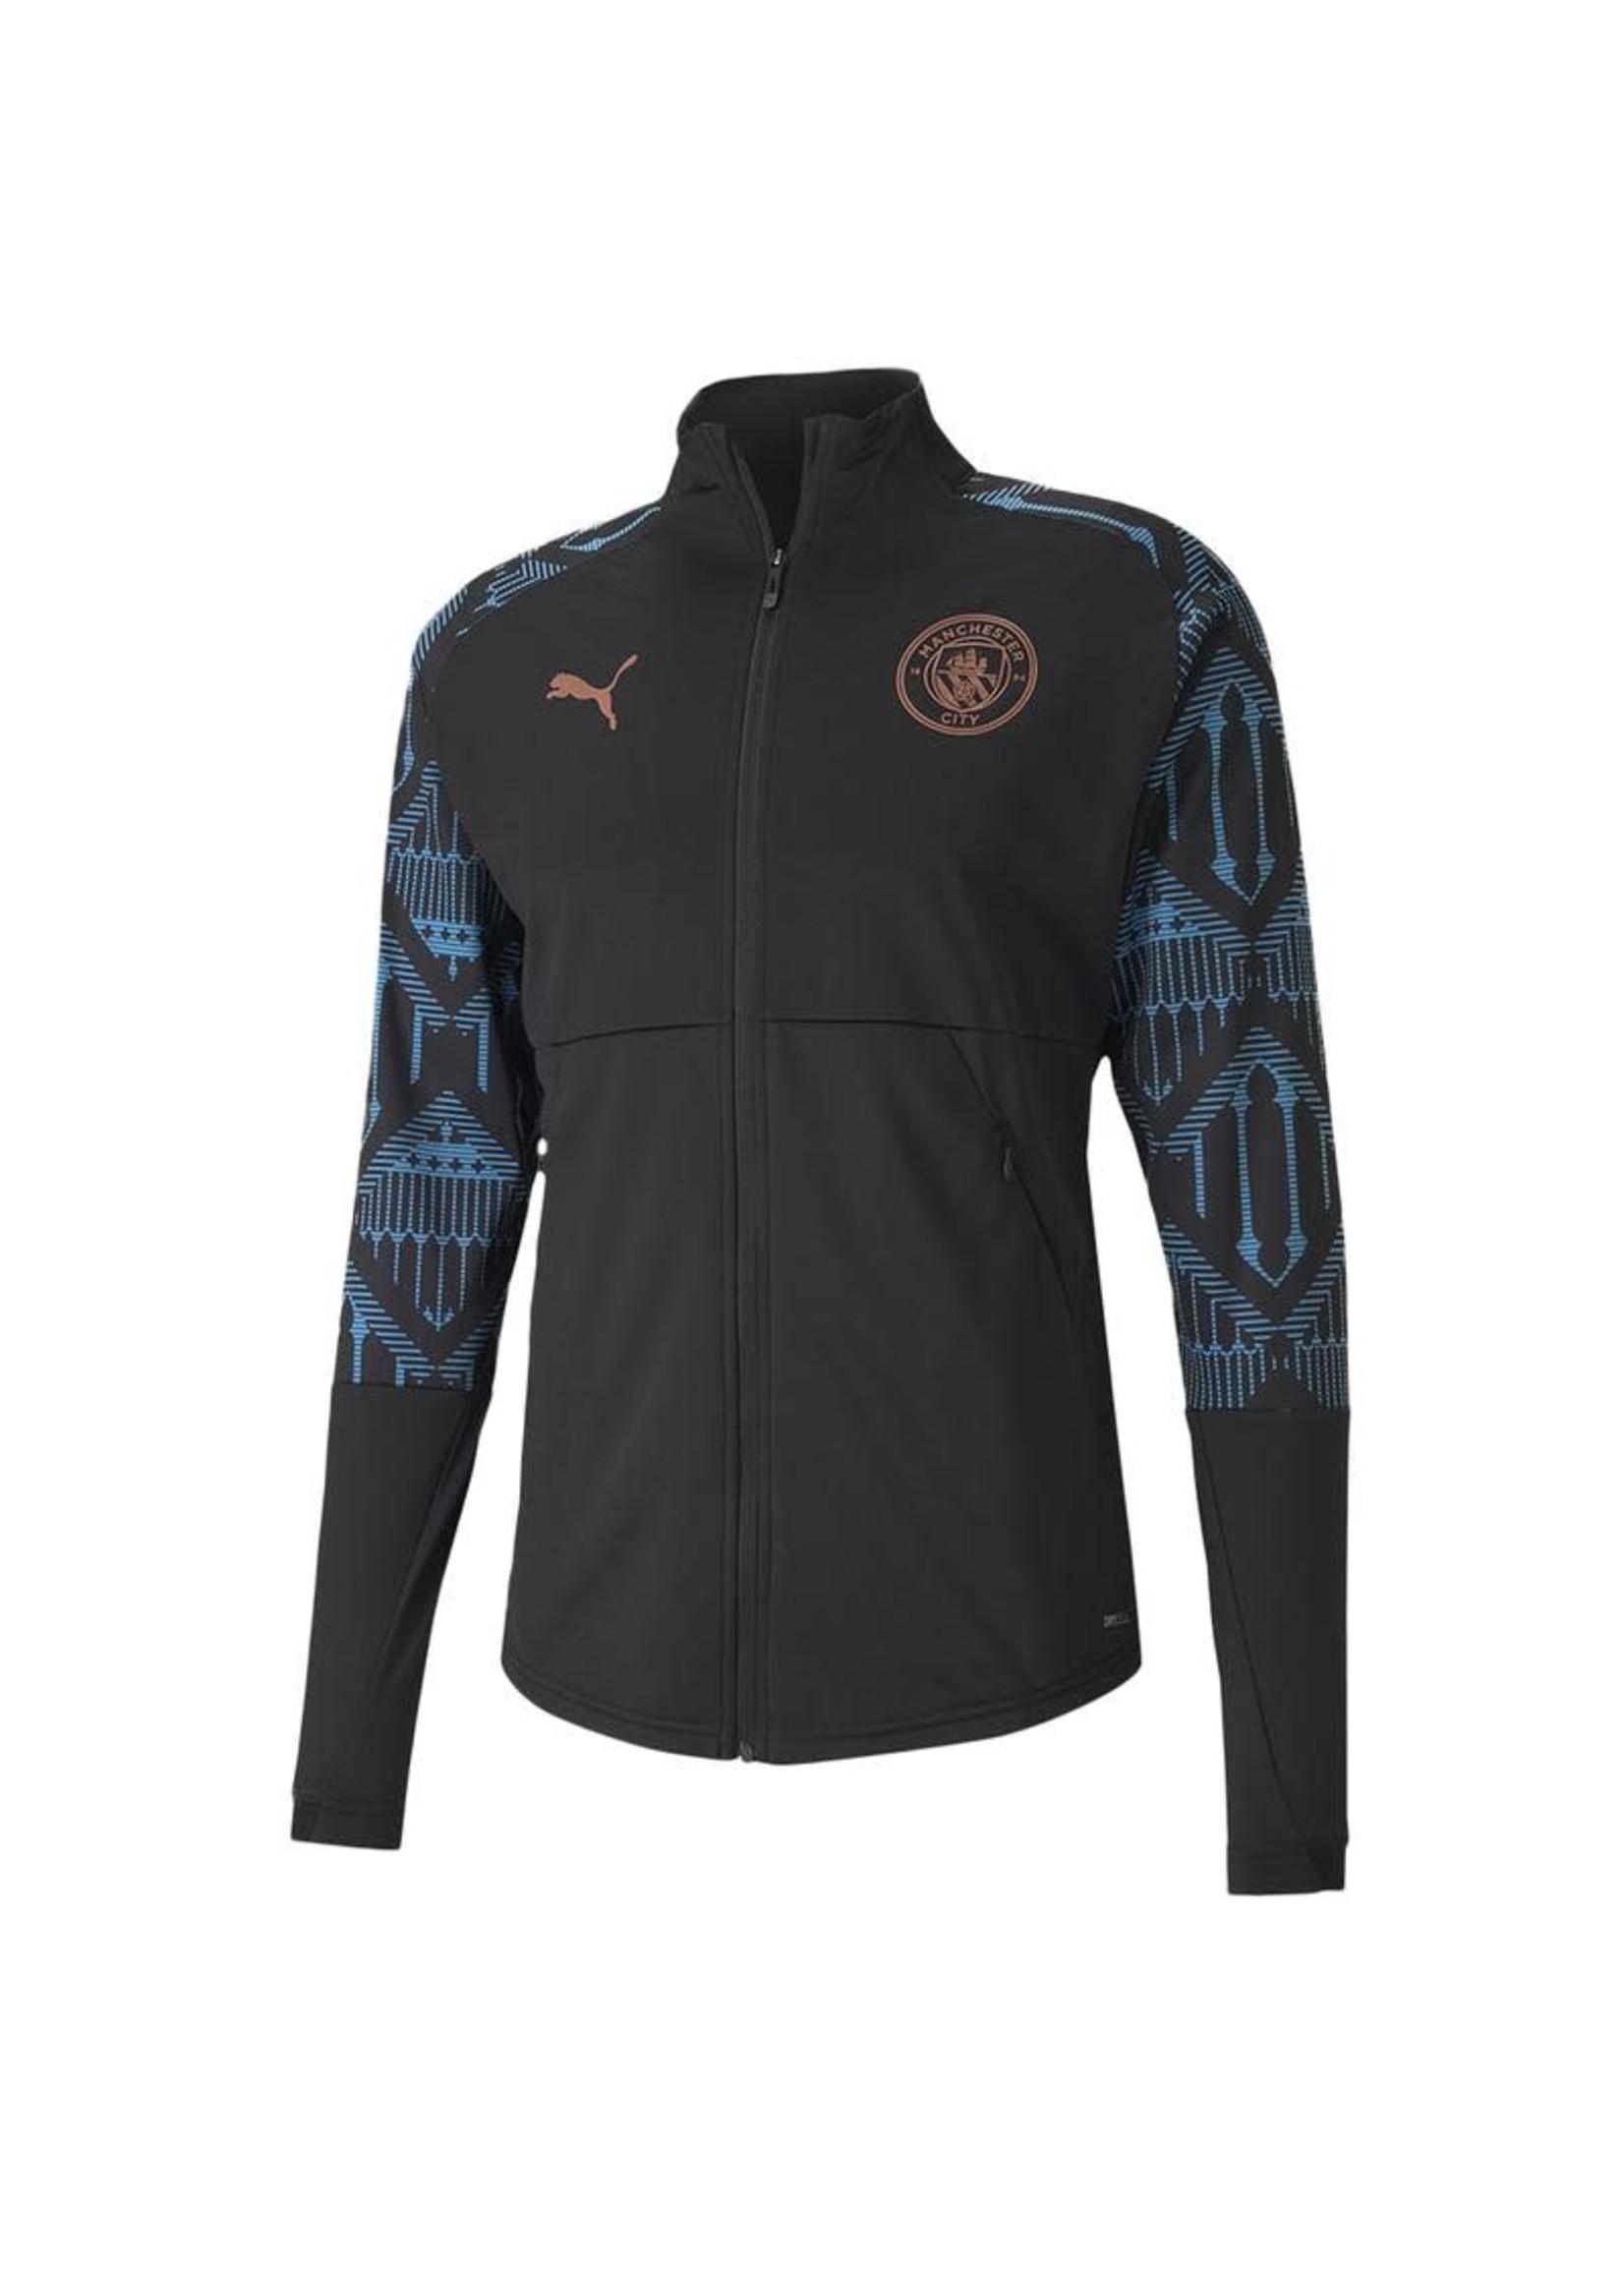 Puma Manchester City Stadium Track Jacket - 20/21 Away